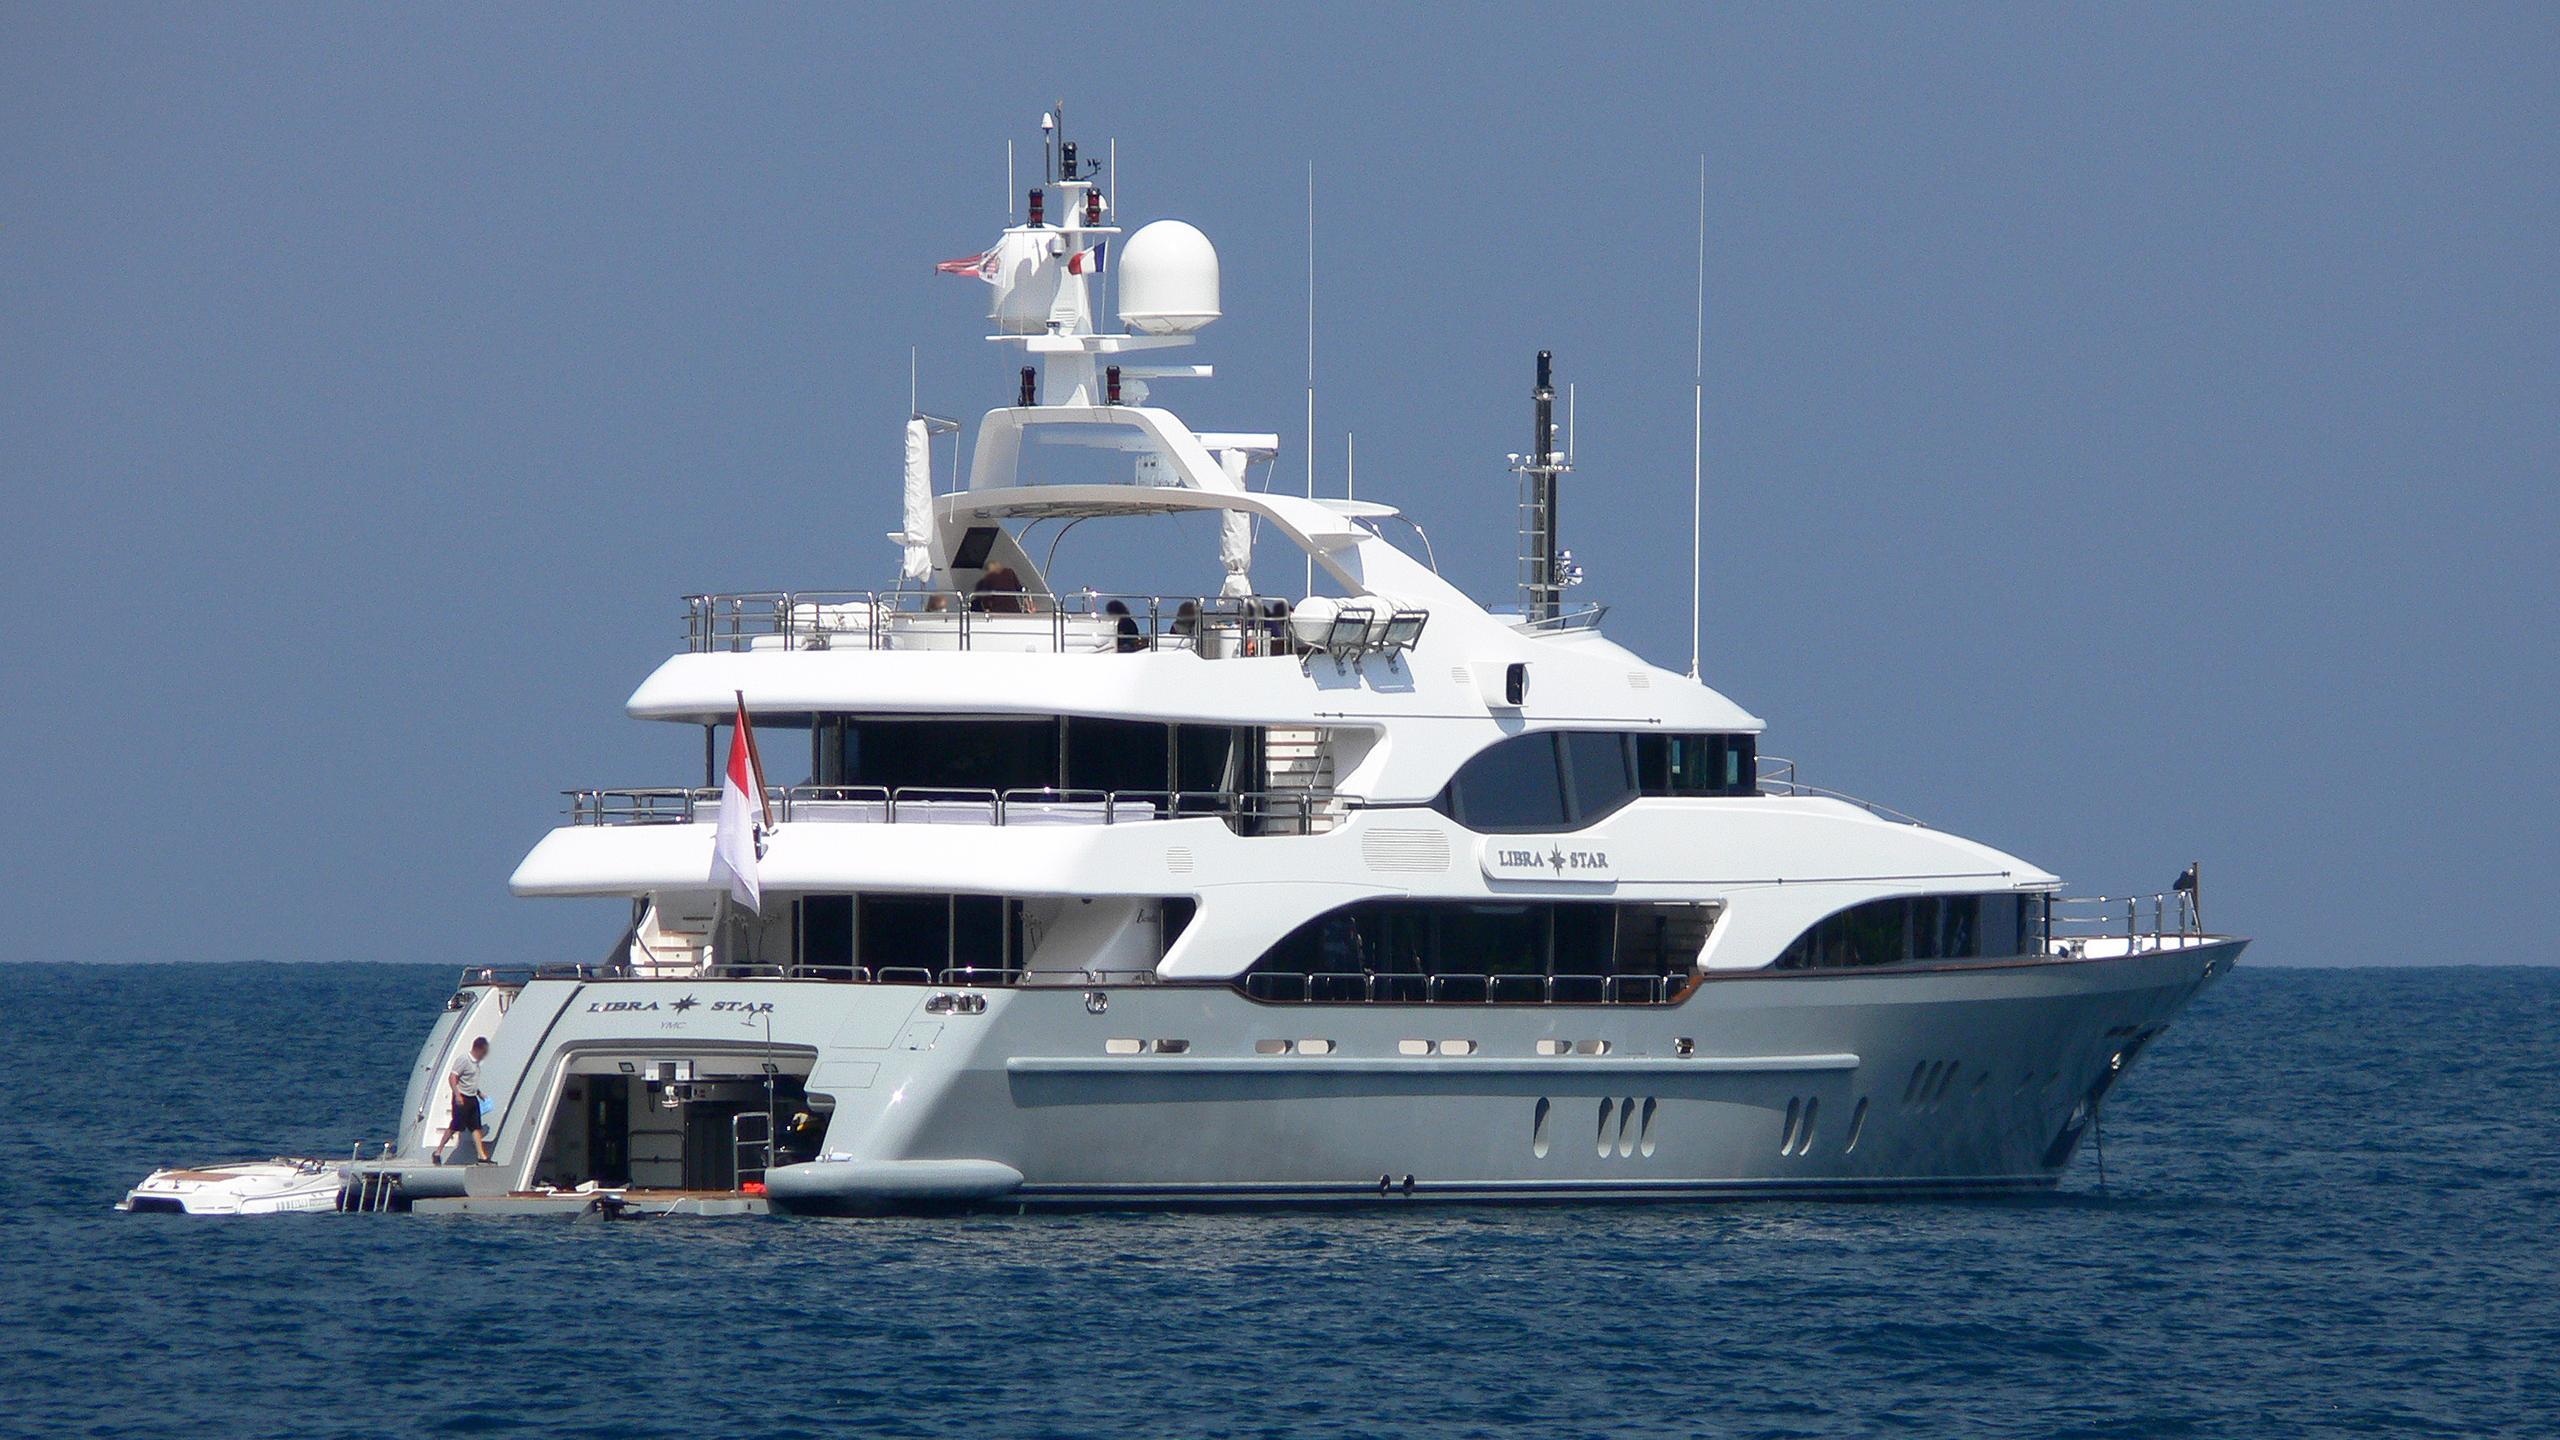 justa delia libra star motor yacht benetti vision 2008 44m stern